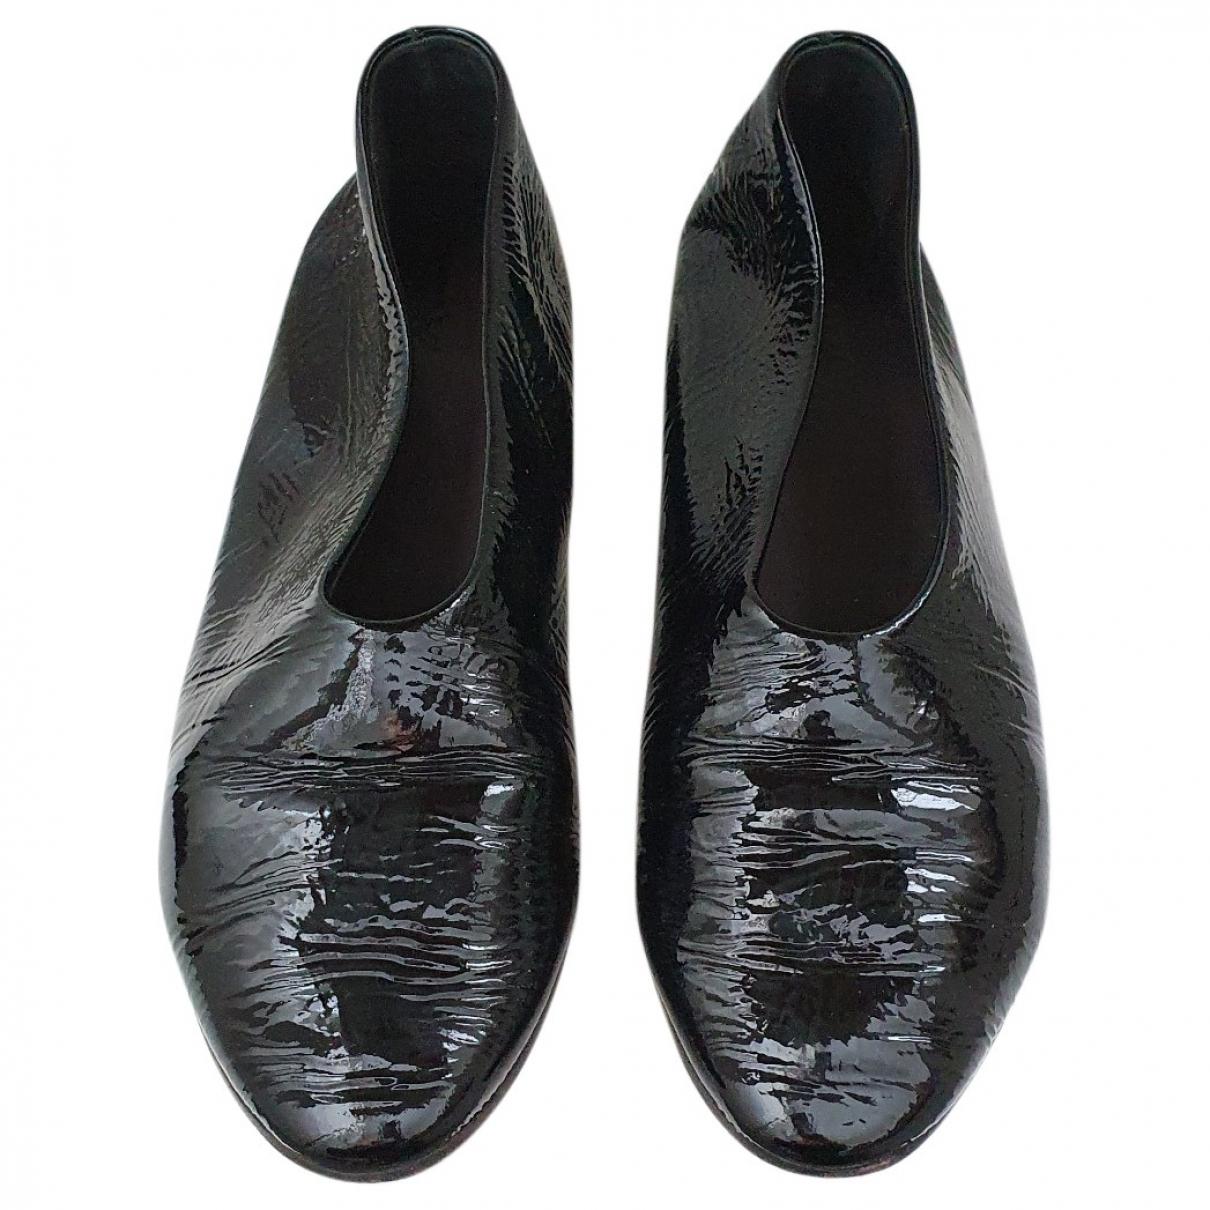 Marsell - Ballerines   pour femme en cuir verni - noir